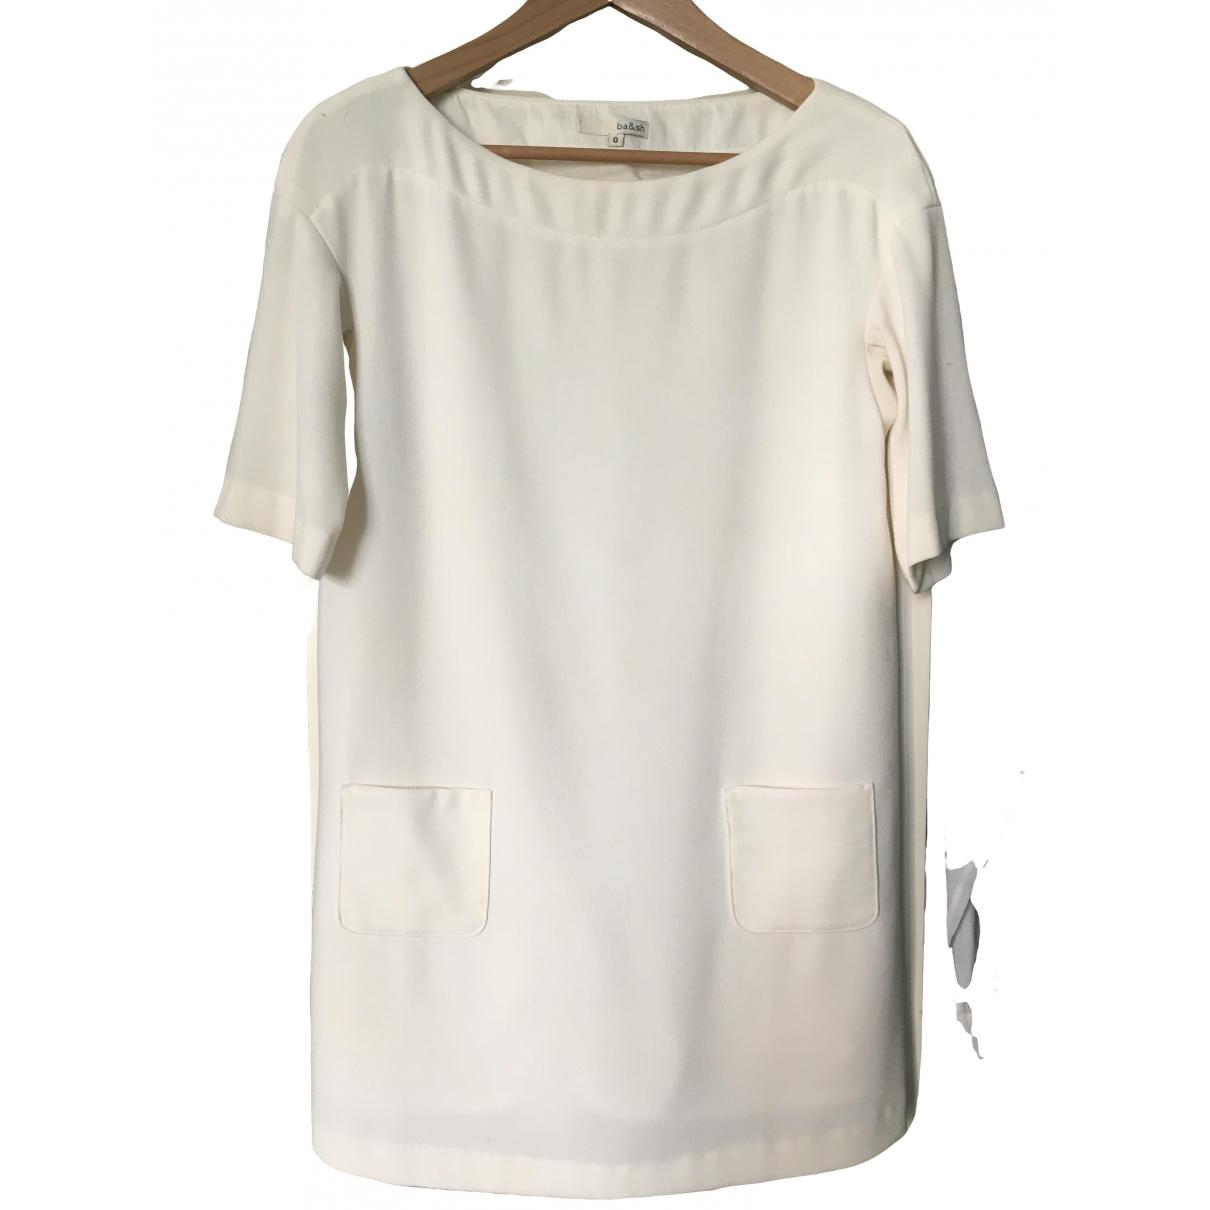 Ba&sh \N Ecru dress for Women 36 FR